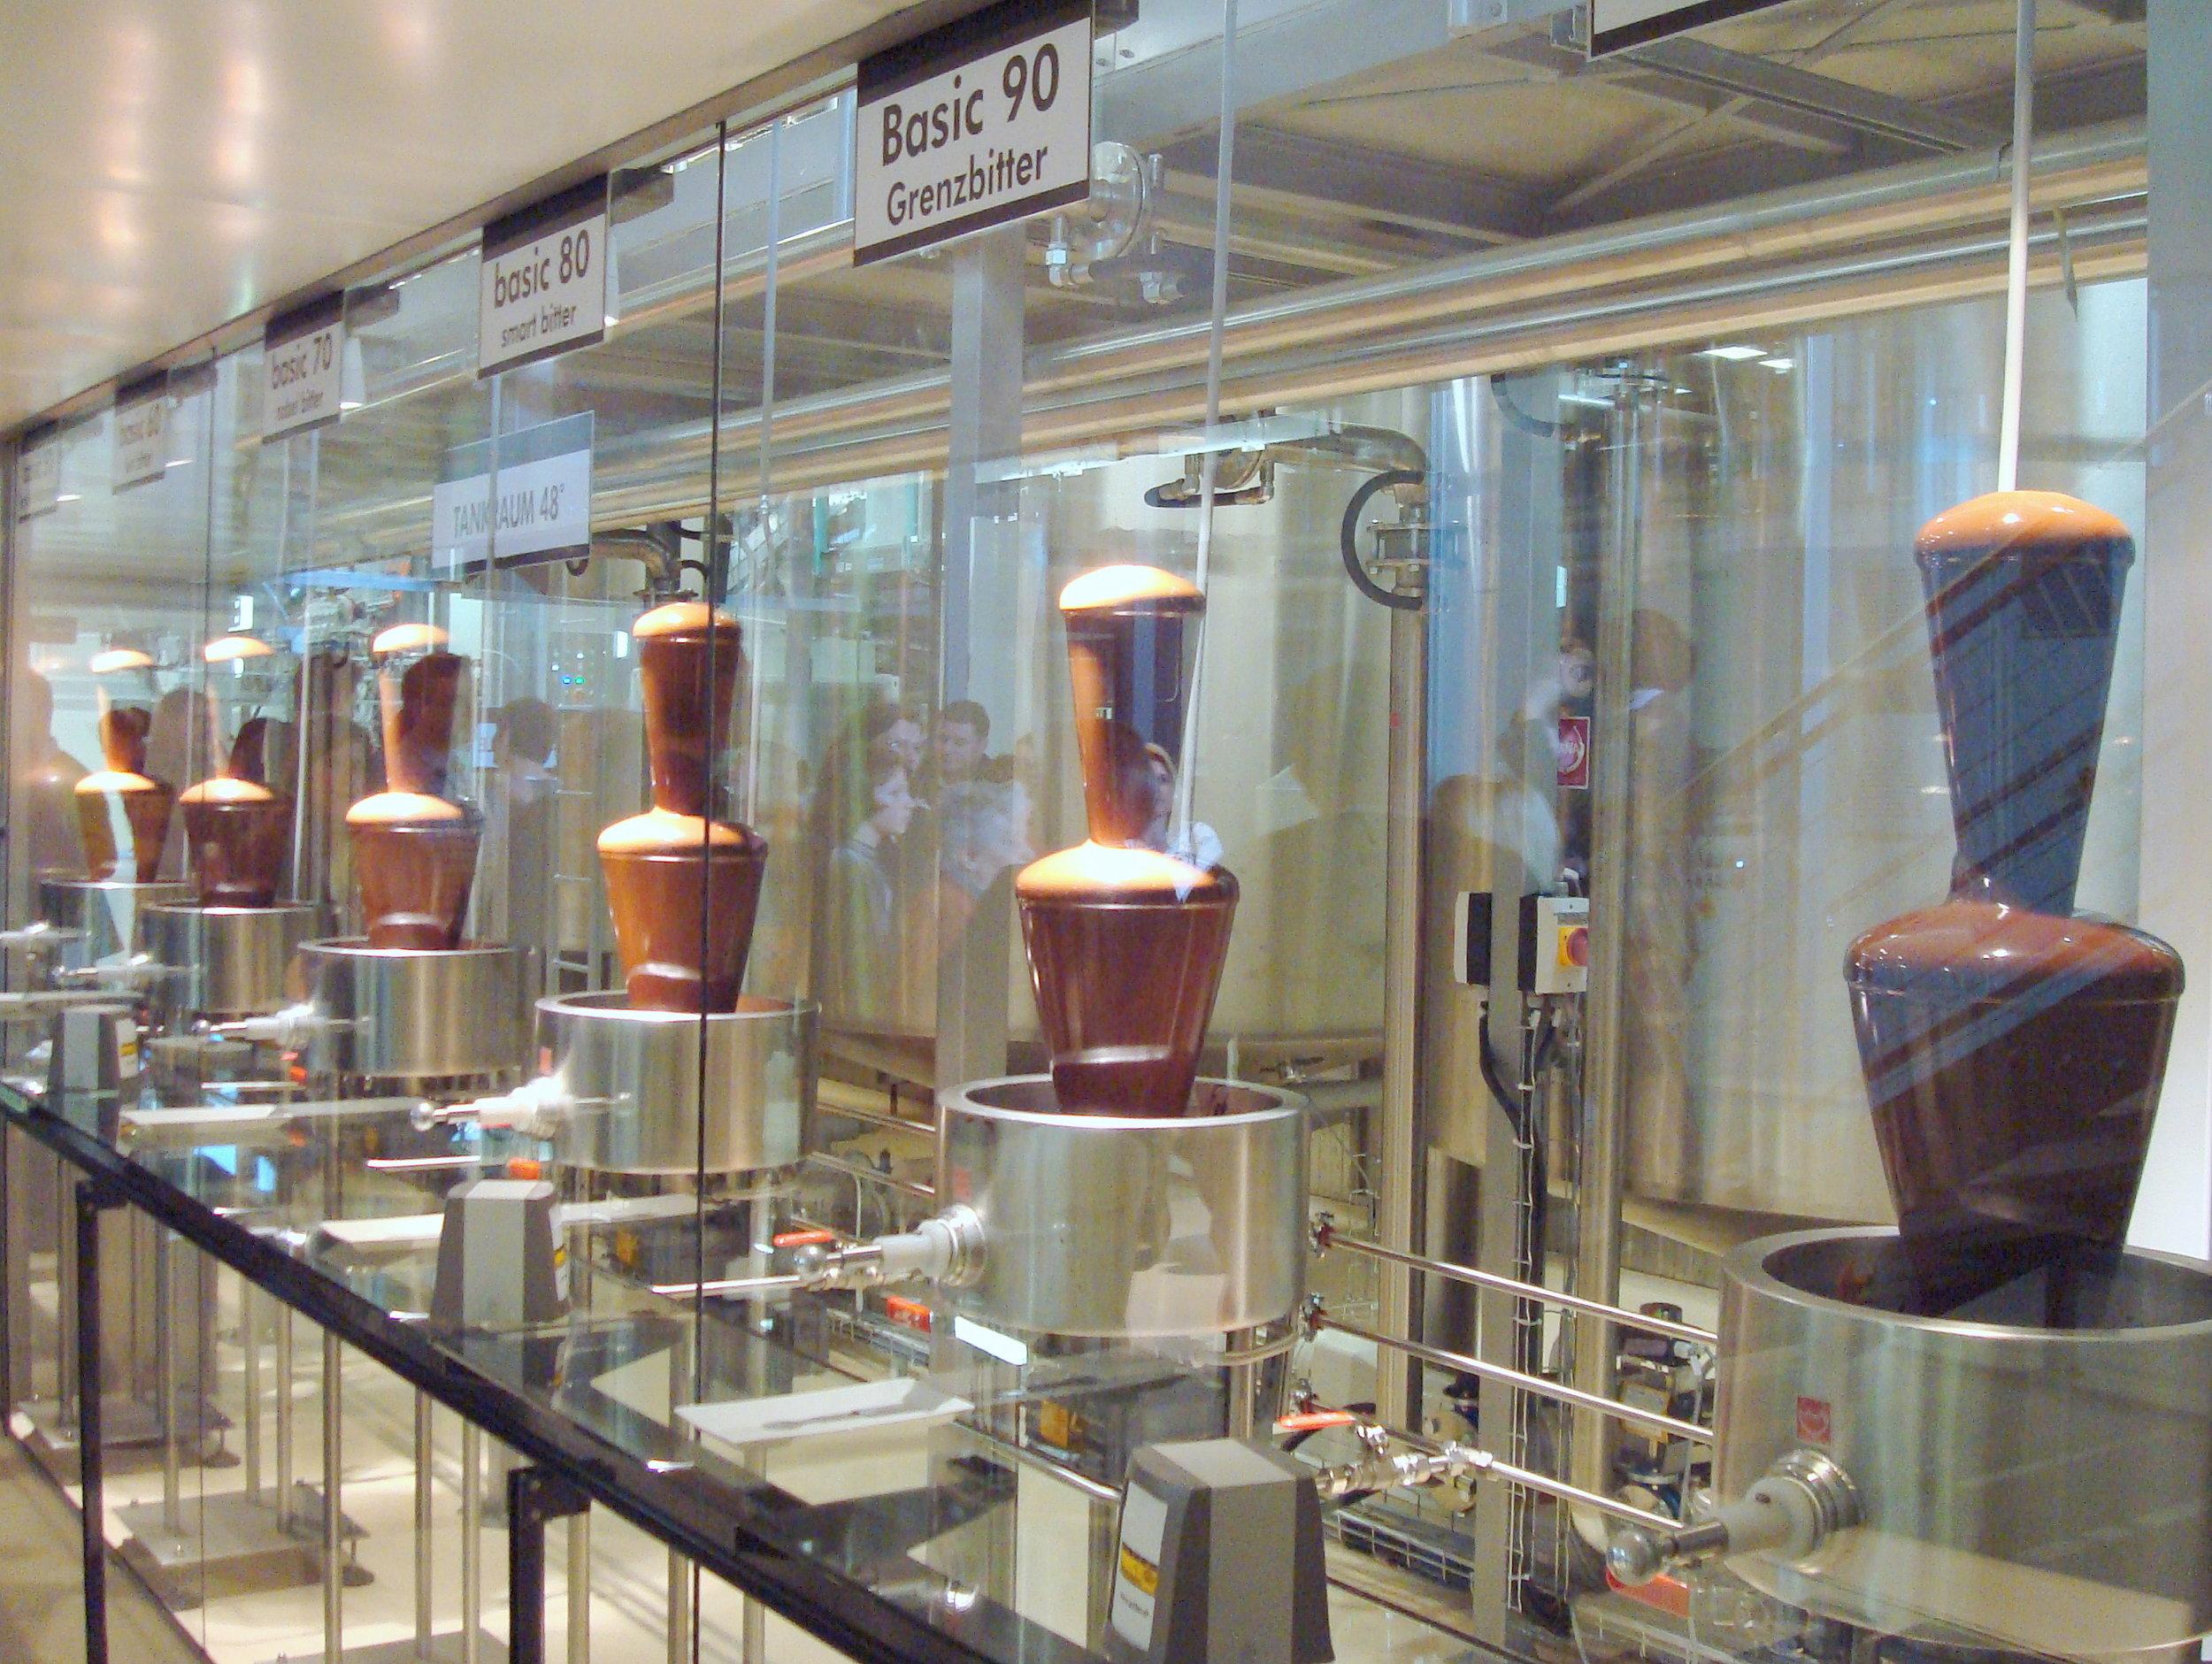 Schokoladenmanufaktur_Zotter_Bergl_Riegersburg_Schokotankstelle_BASIC_50-100.JPG